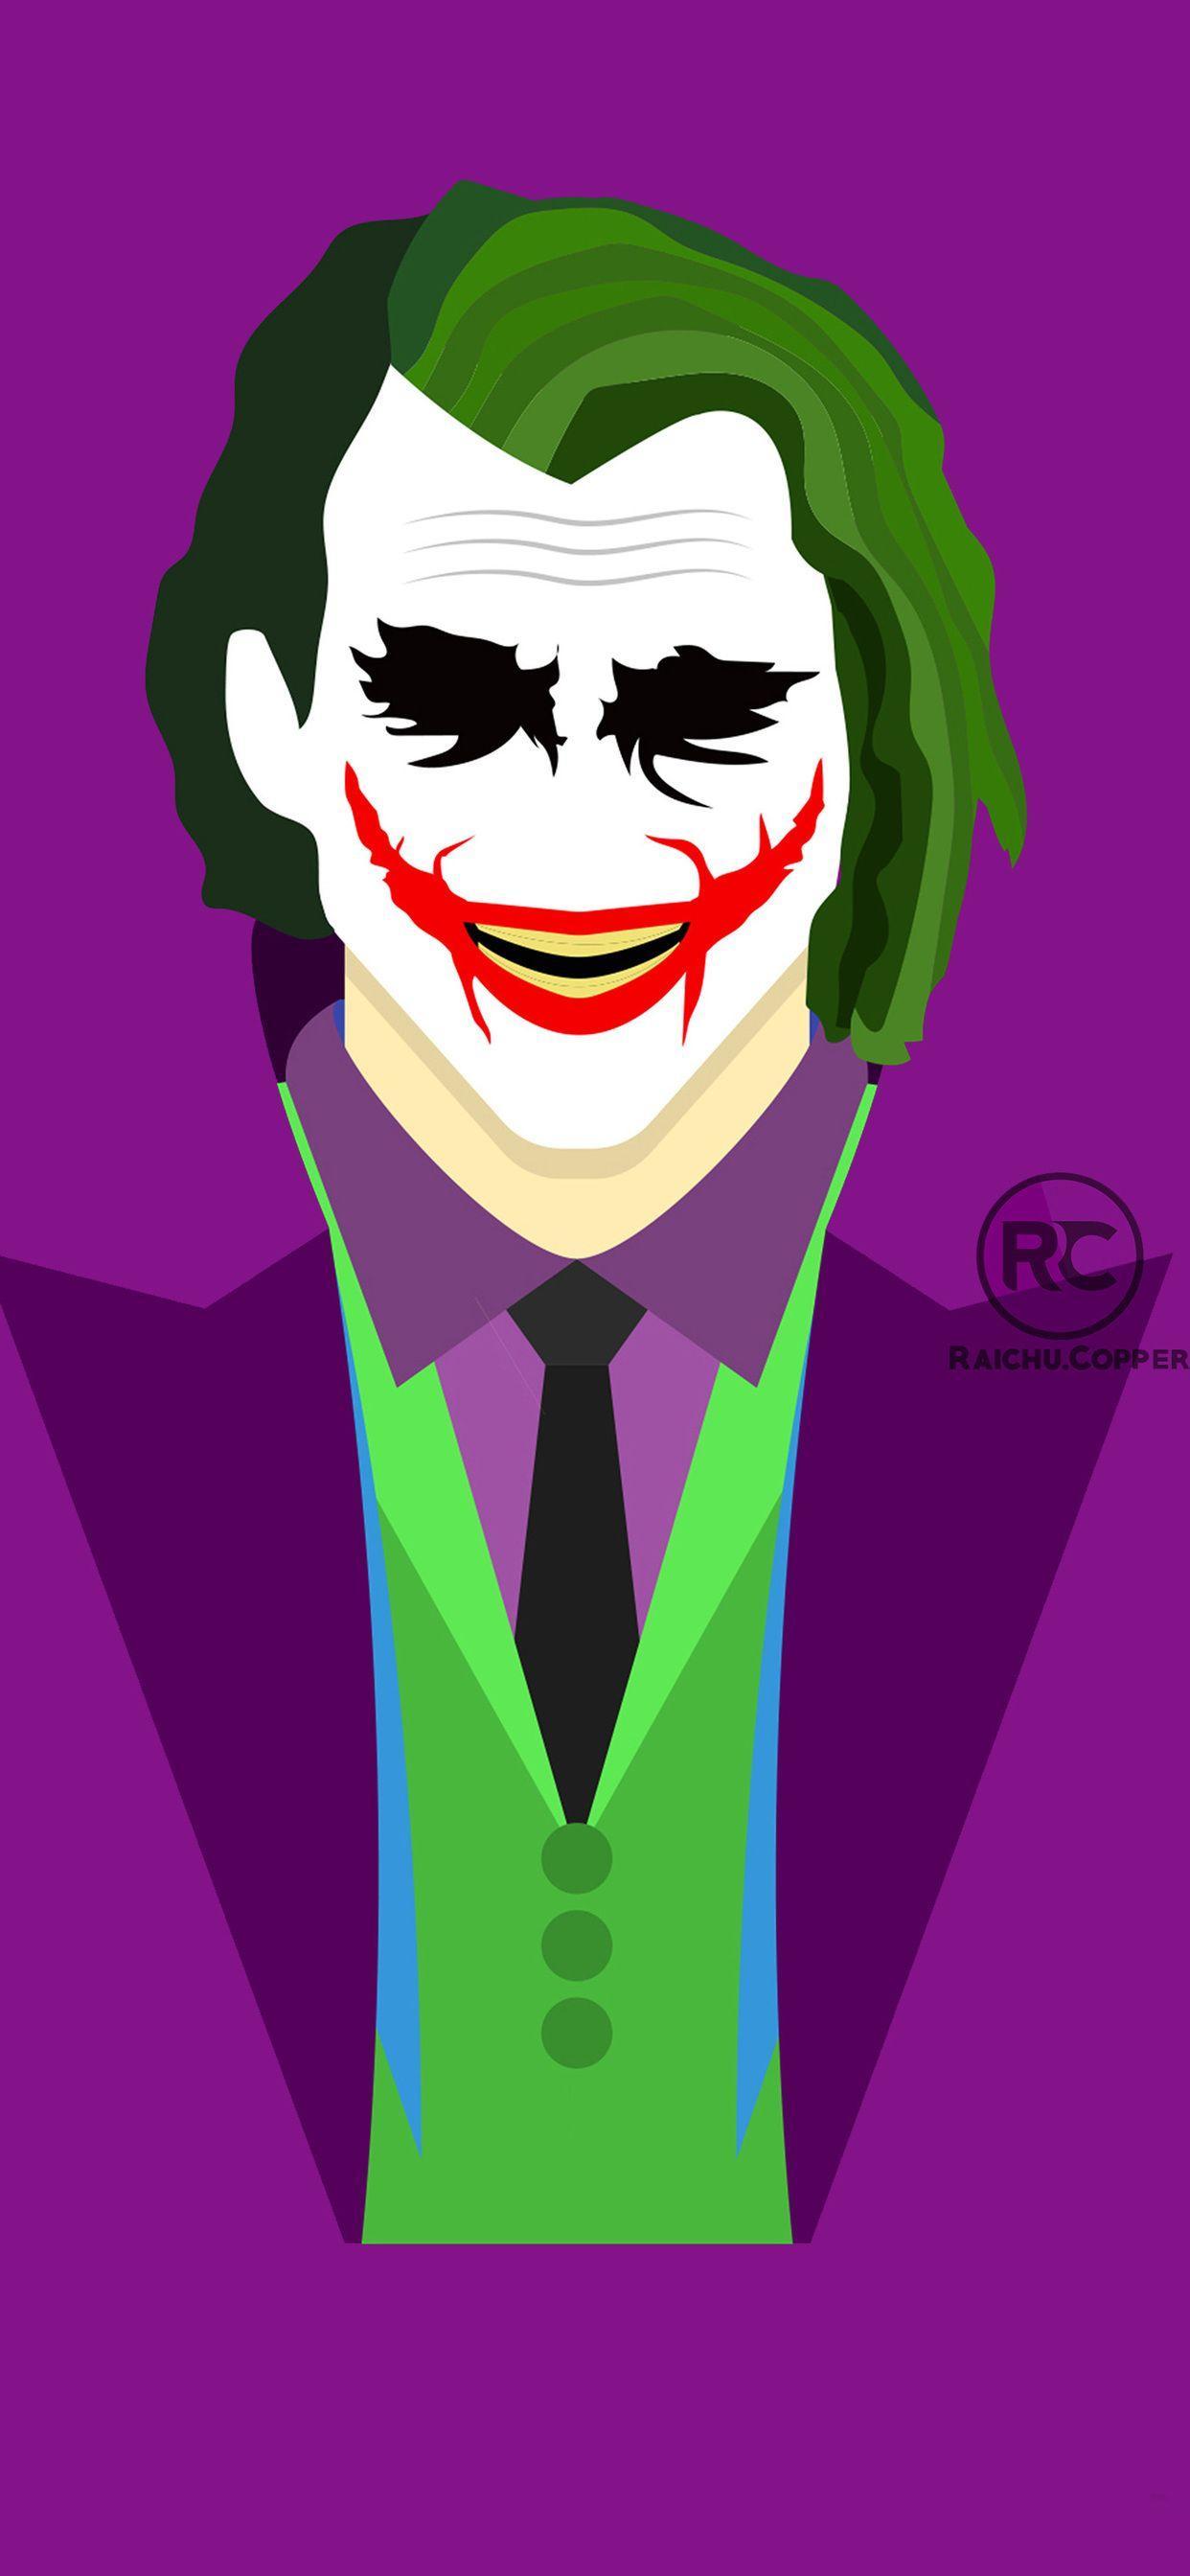 Joker Heath Iphone Wallpapers Top Free Joker Heath Iphone